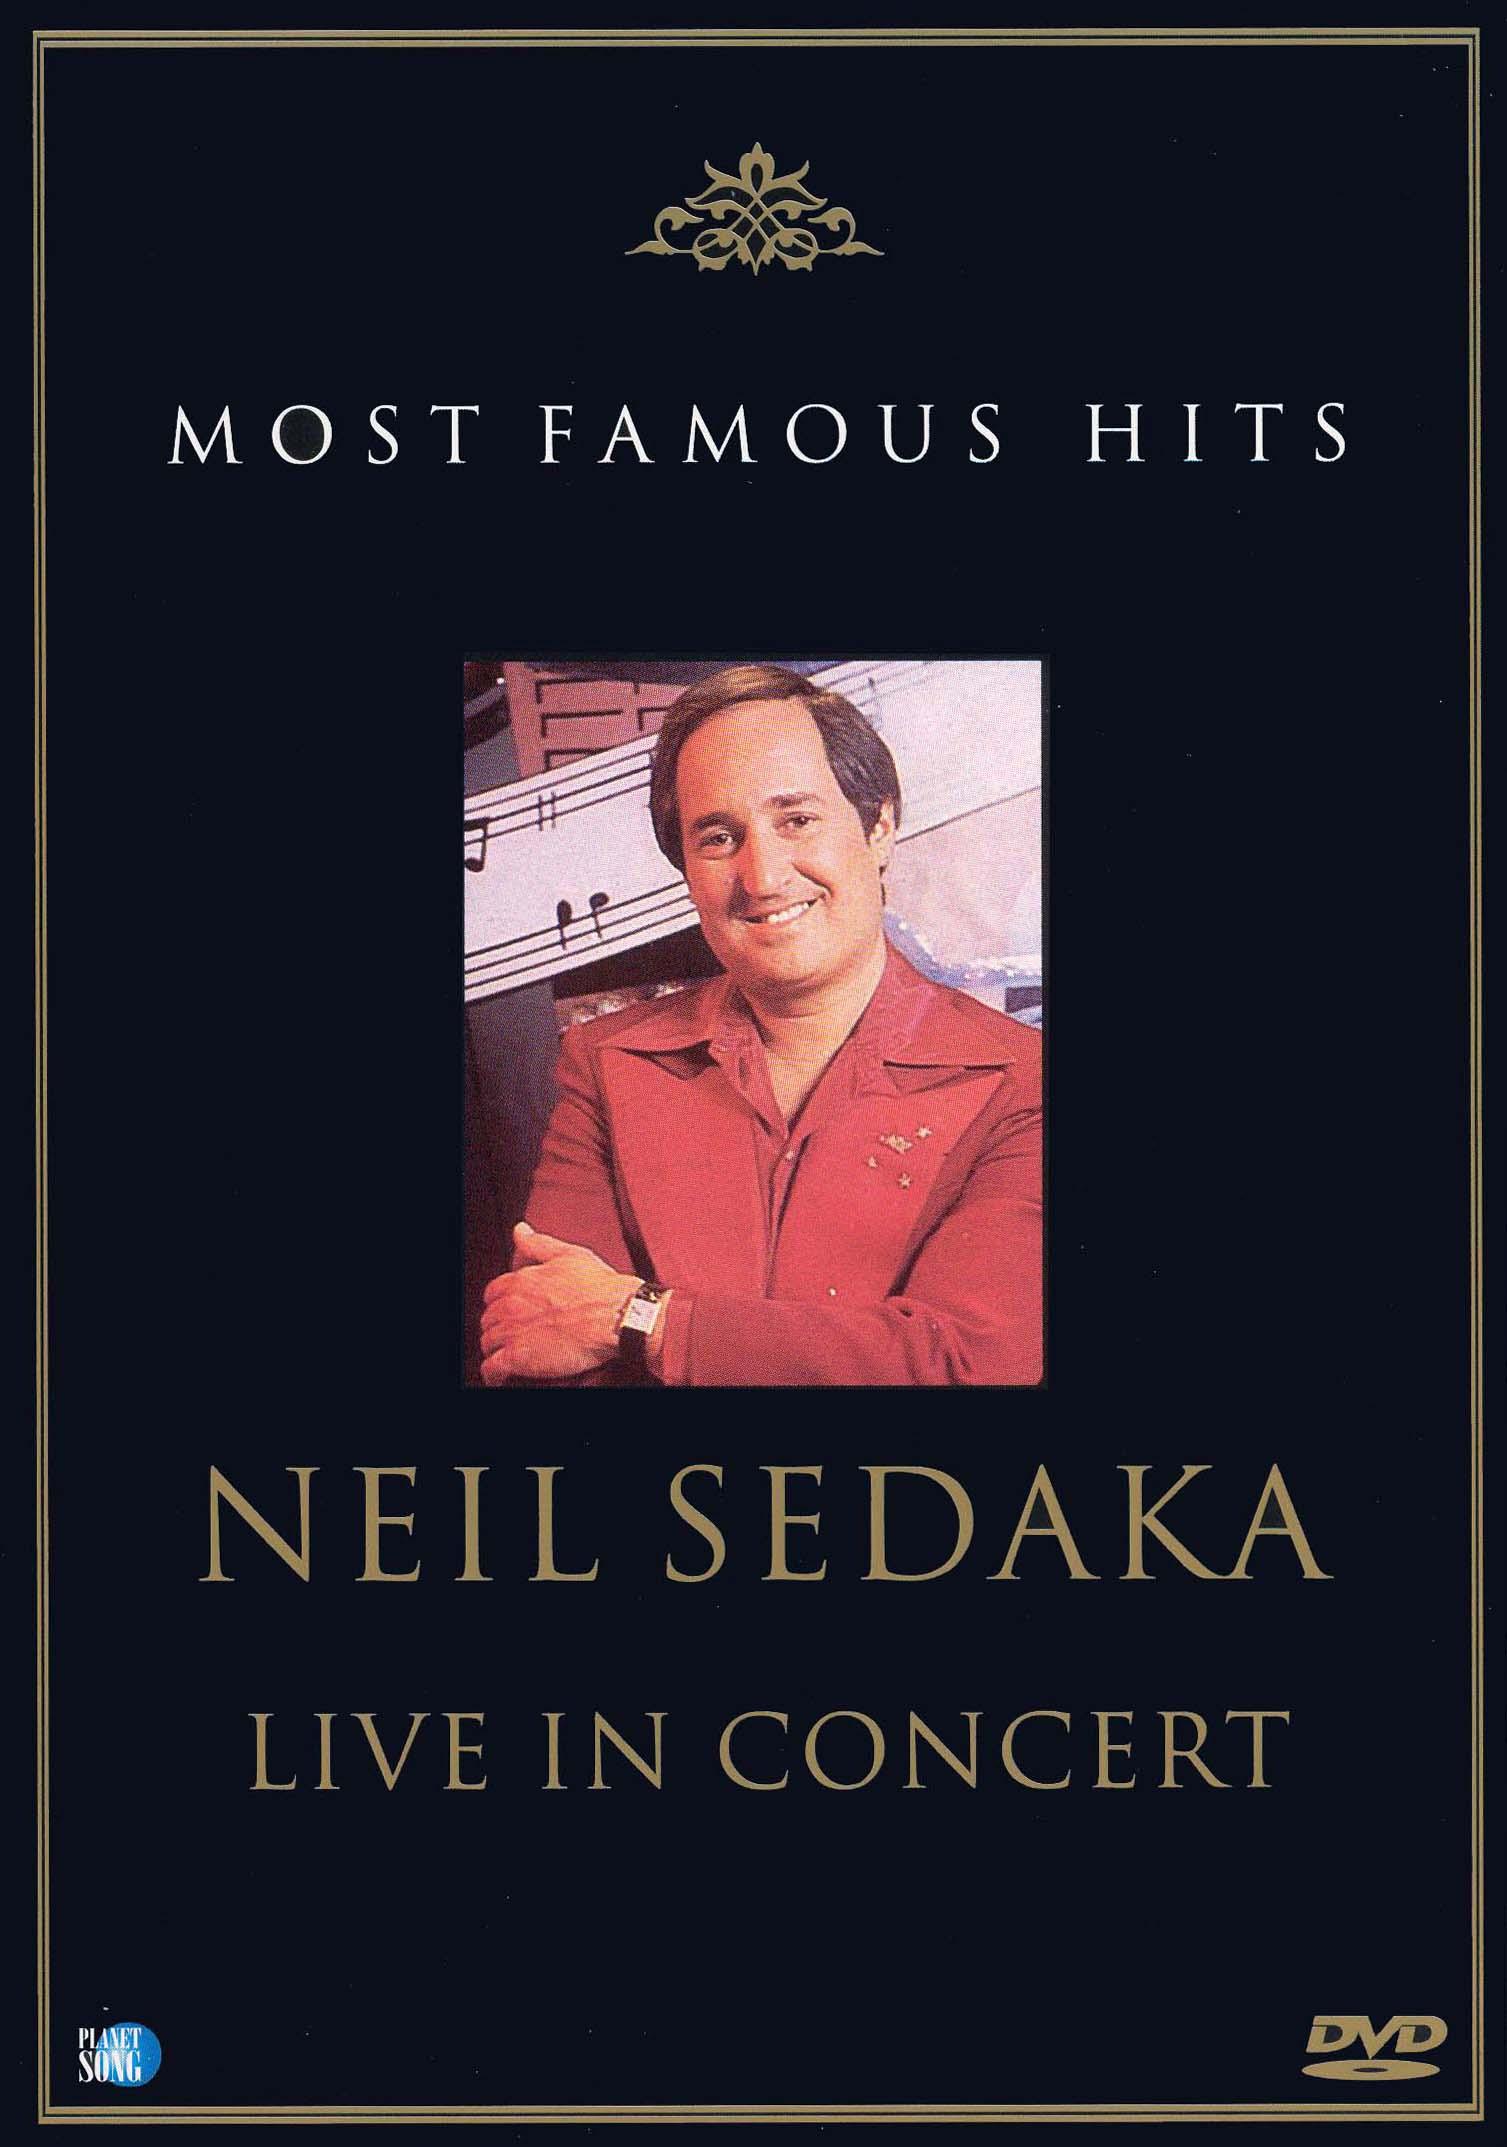 Most Famous Hits: Neil Sedaka - Live in Concert